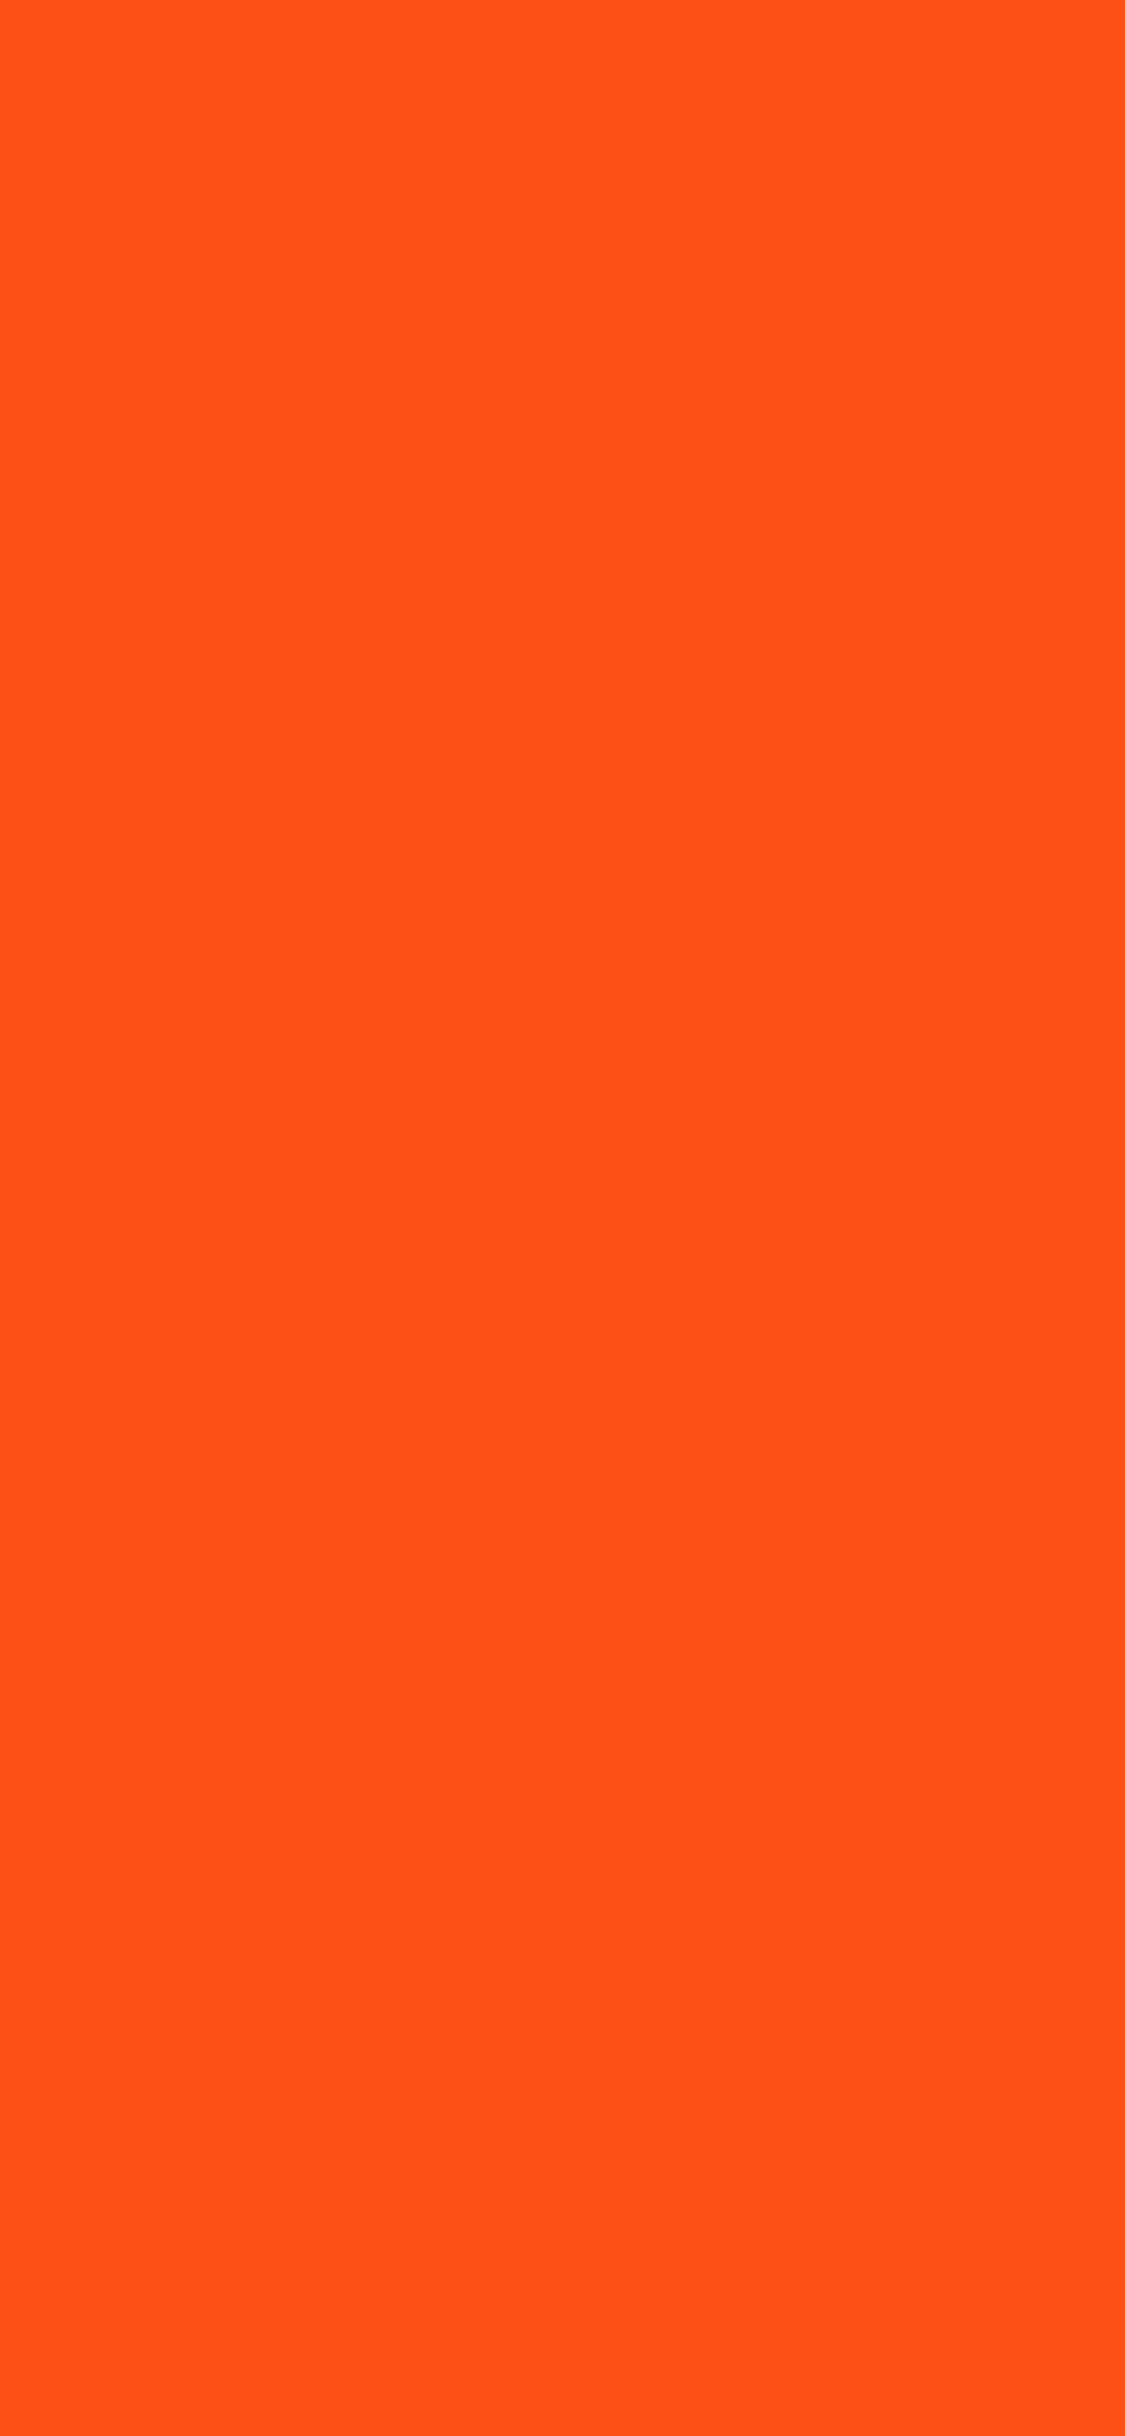 1125x2436 Orioles Orange Solid Color Background